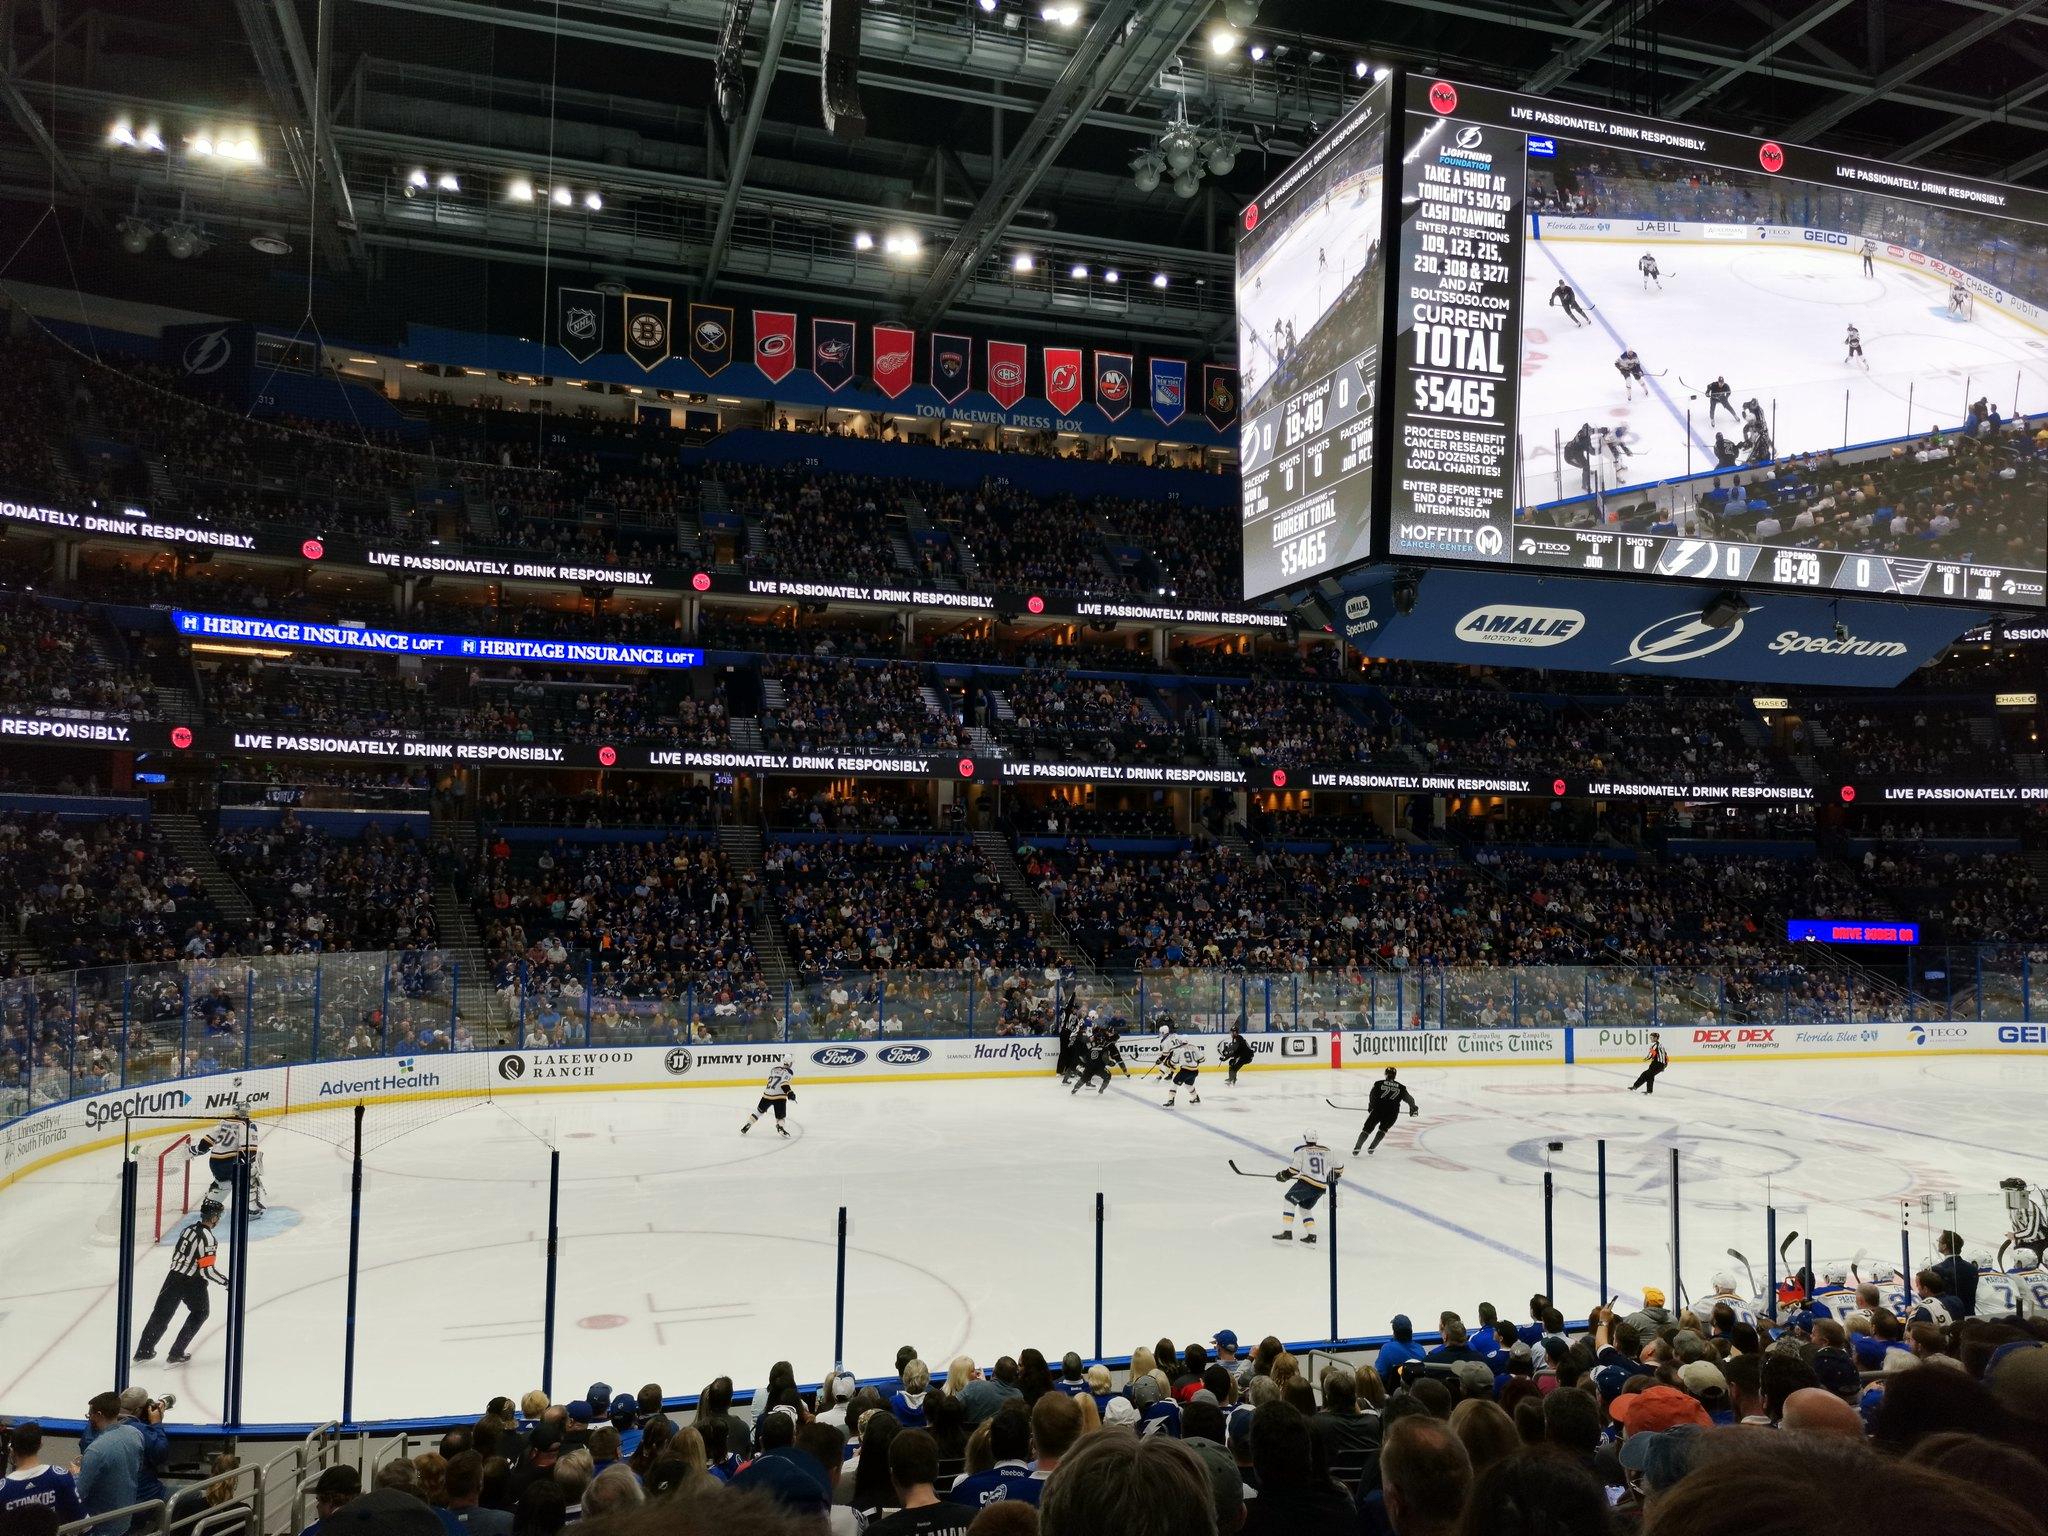 Honor View 20 - Hockey Game